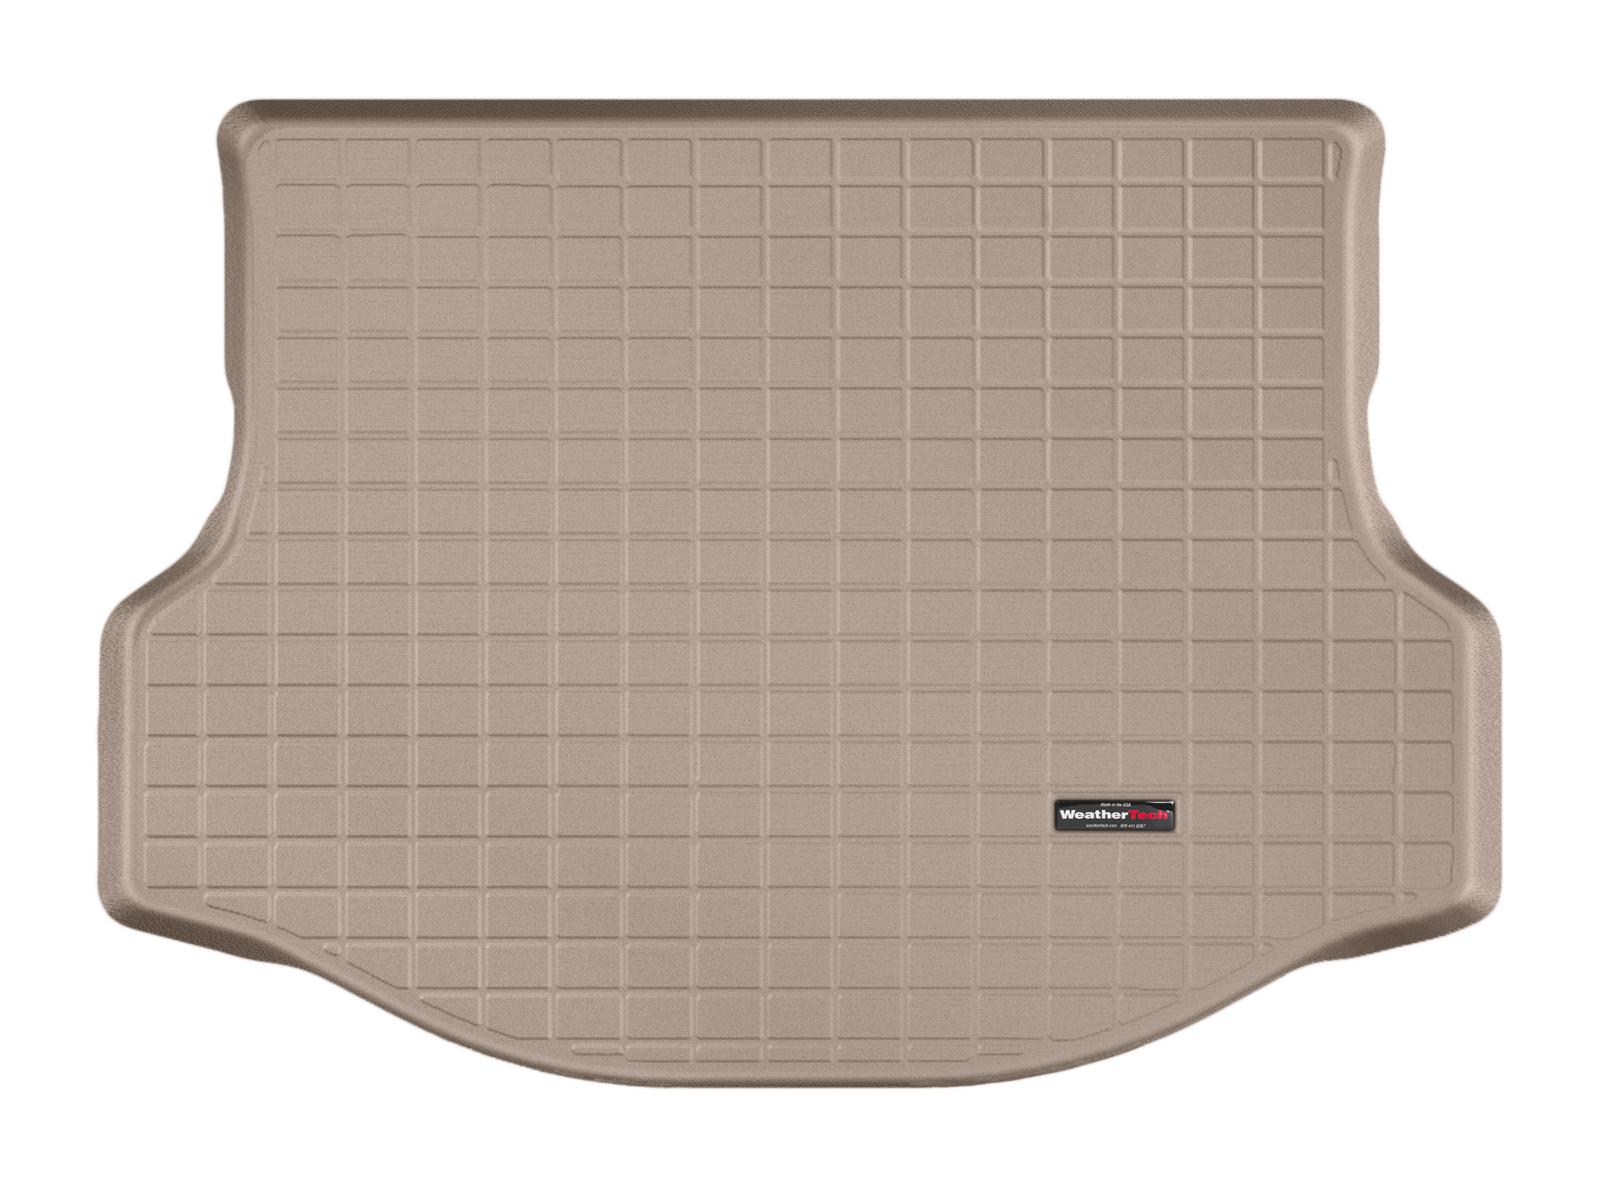 Toyota RAV4 2013>2013 Vasca baule WeatherTech bagagliaio marrone *1291*